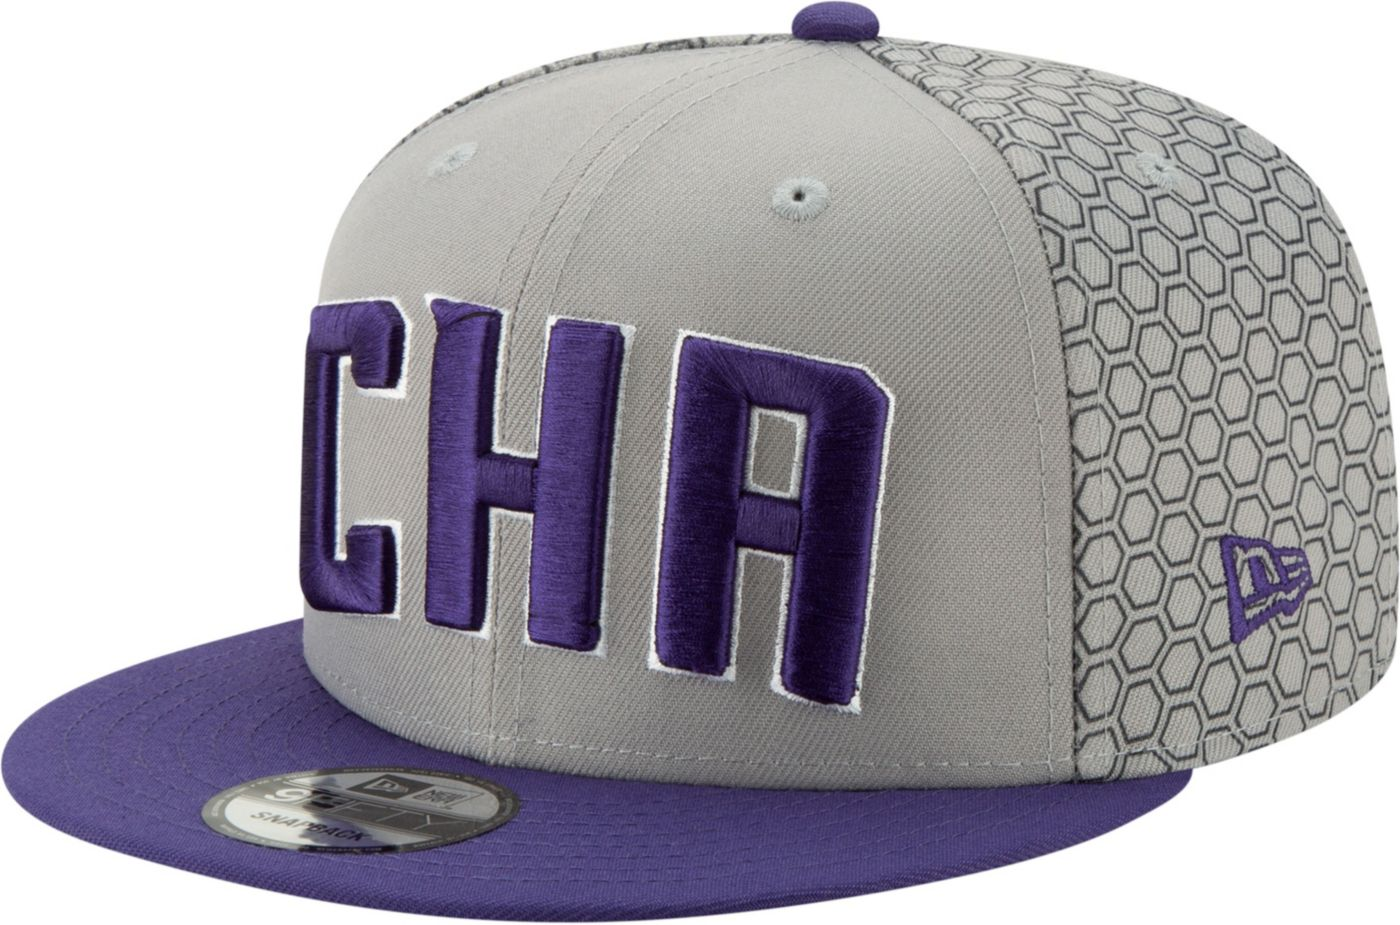 New Era Men's Charlotte Hornets 9Fifty City Edition Adjustable Snapback Hat